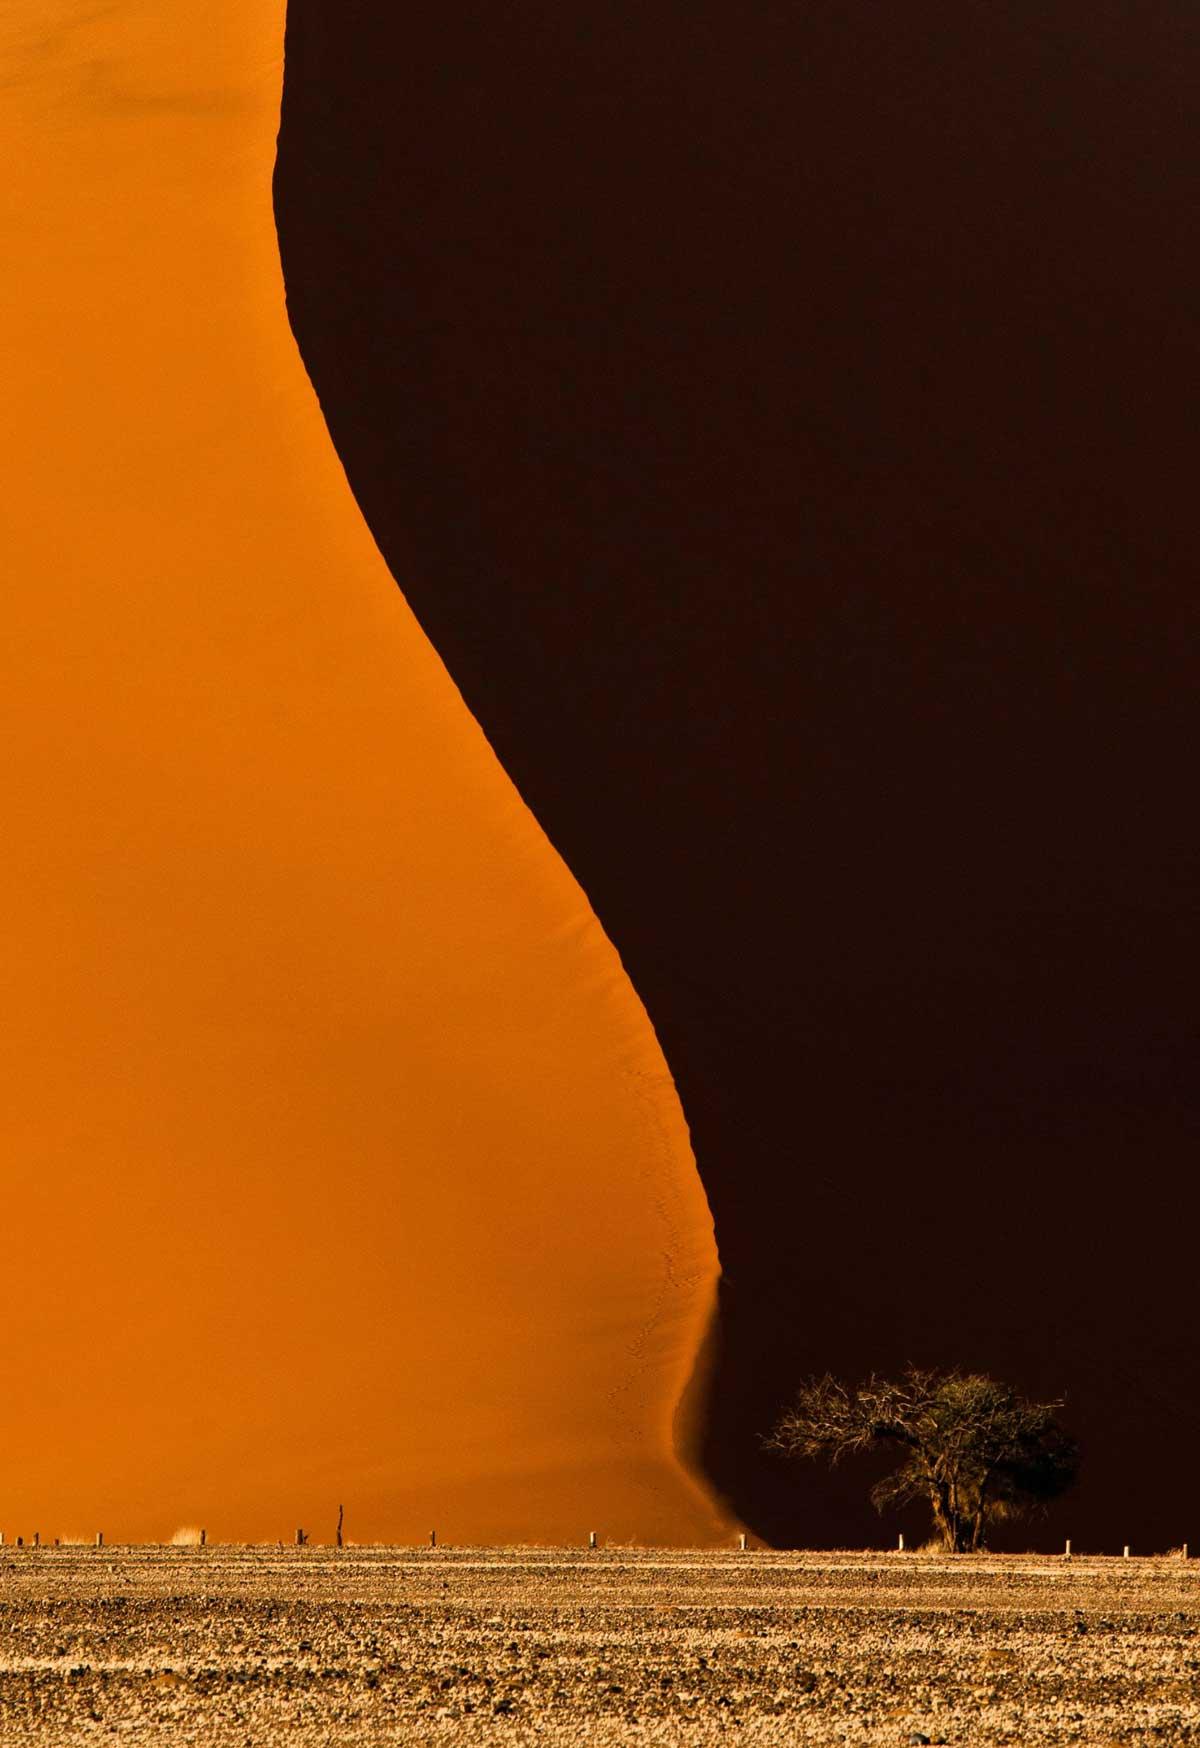 Gigantic sand dune in Namibia